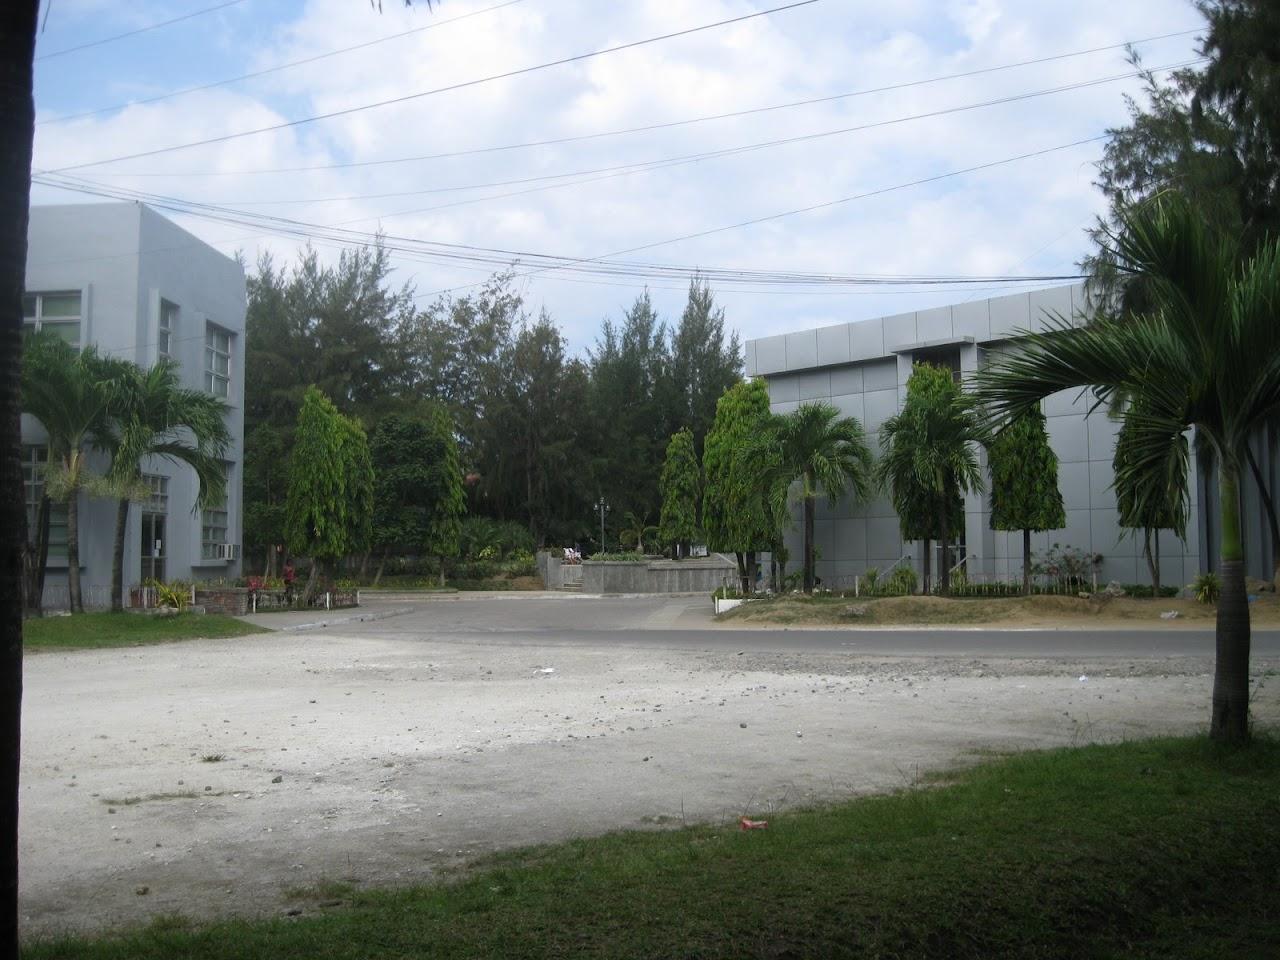 [Danao-City-Hall-and-Plaza-3.JPG]